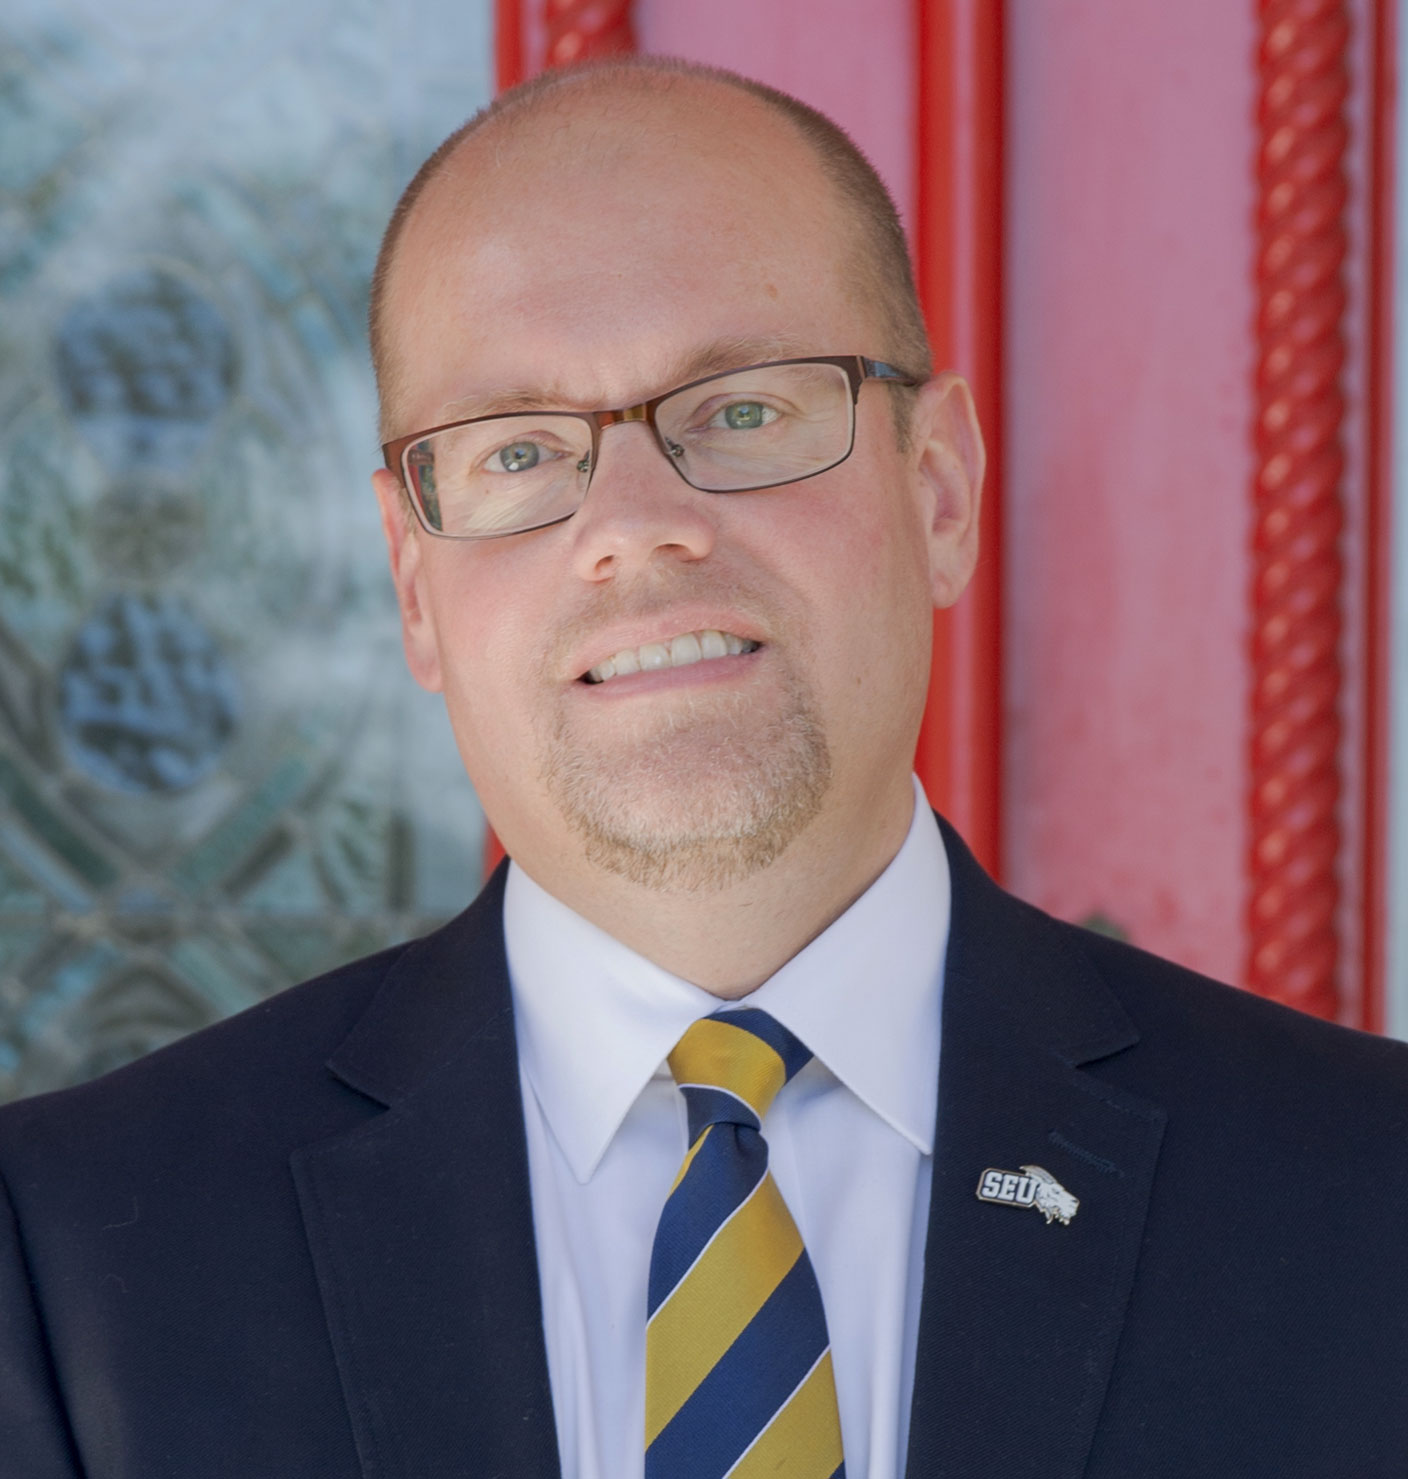 Andrew Prall, Provost, St. Edward's University